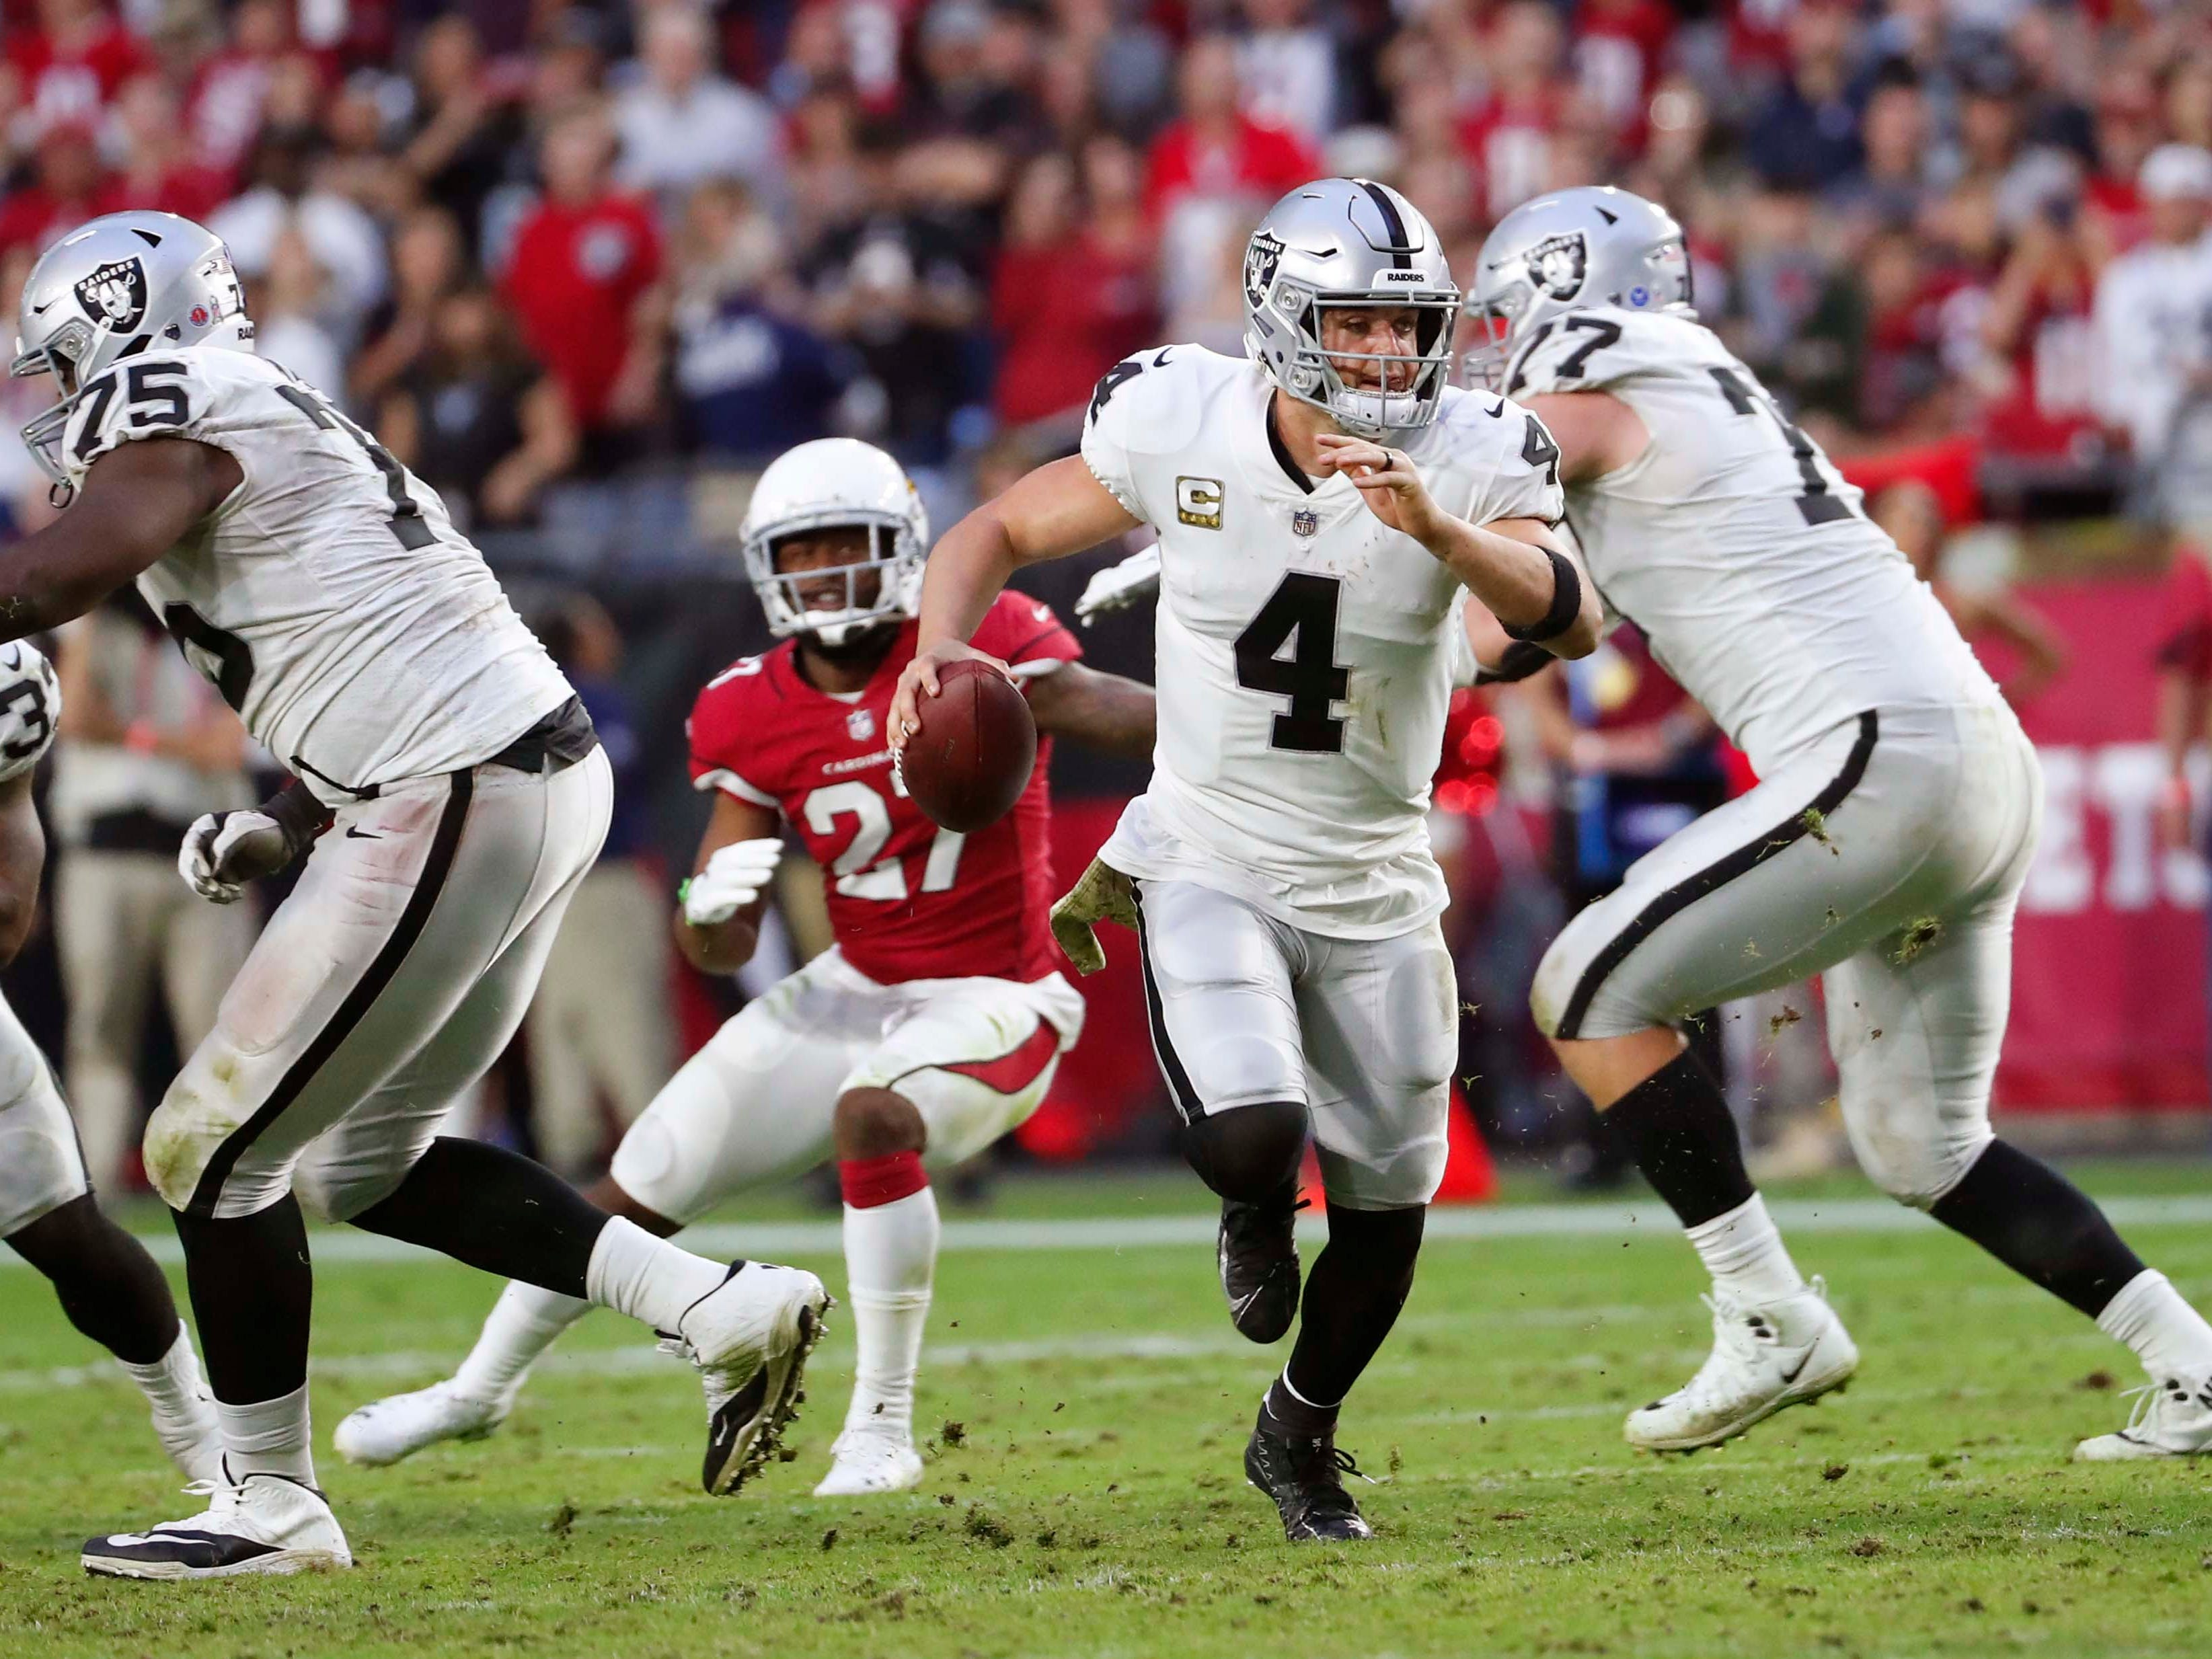 Oakland Raiders quarterback Derek Carr (4) scrambles away from pressure against the Arizona Cardinals during the fourth quarter Nov.18th at State Farm Stadium.